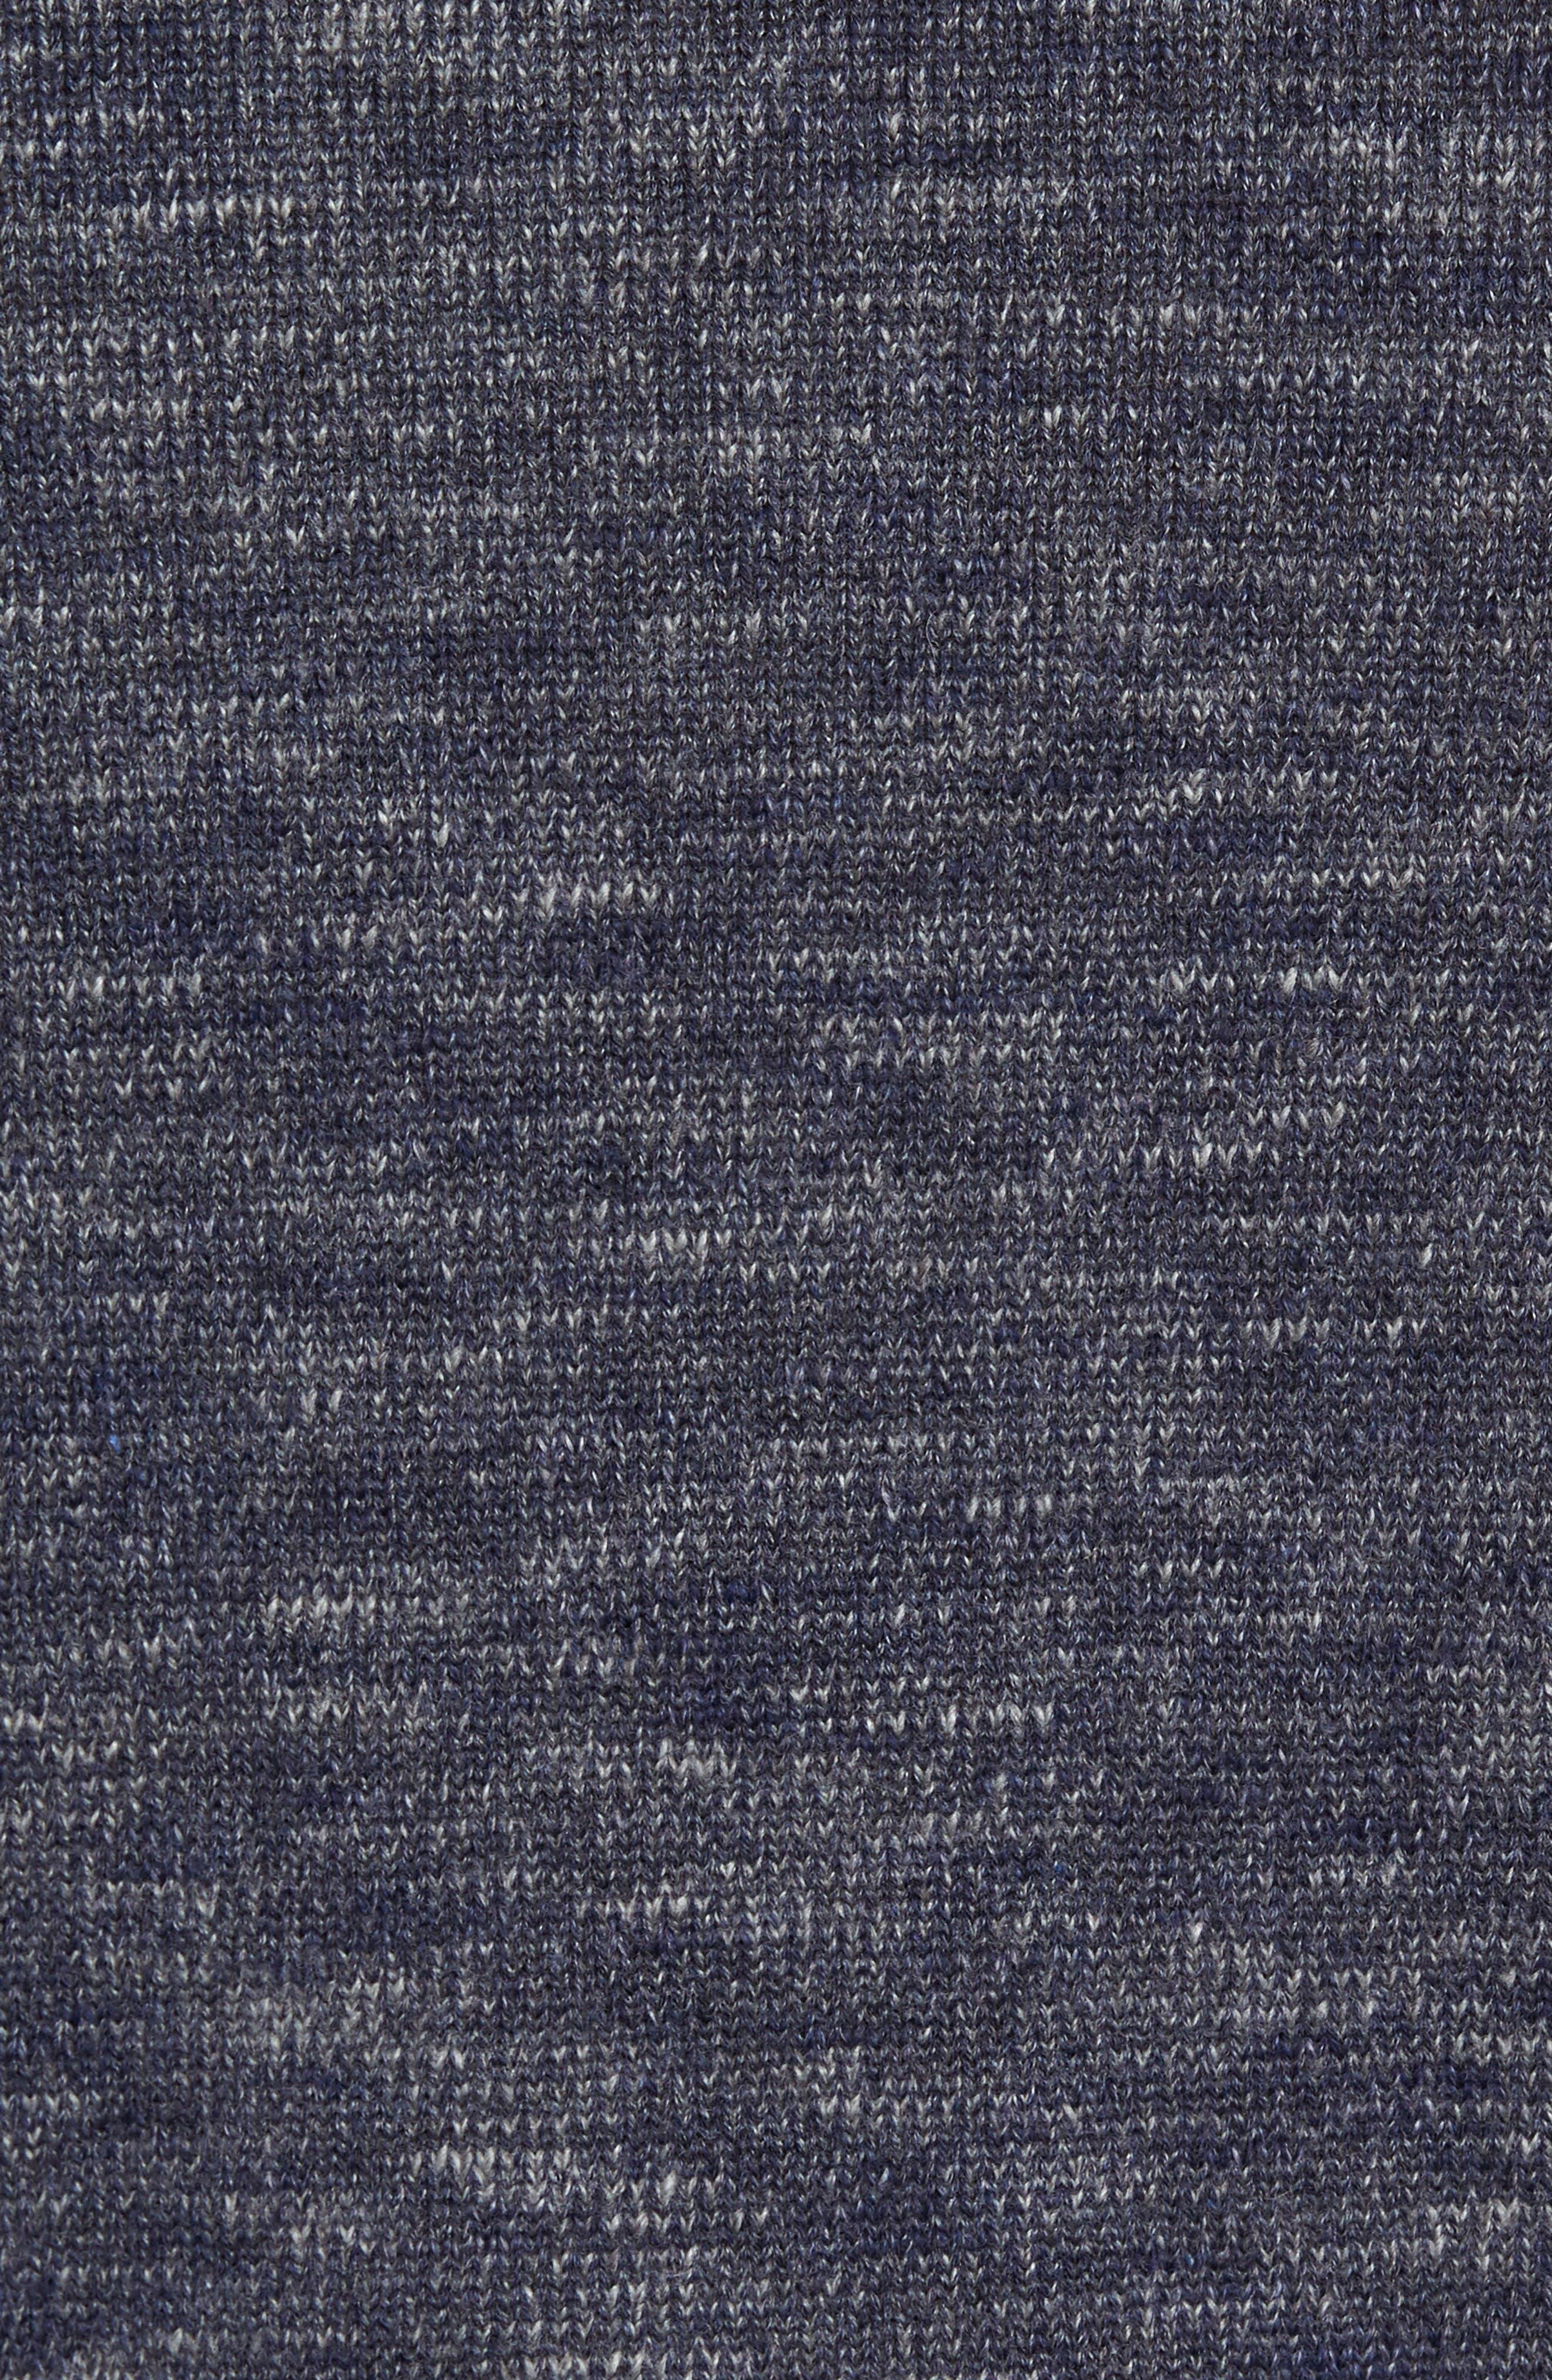 Gran Rey Flip Reversible Cotton & Wool Sweater,                             Alternate thumbnail 4, color,                             Ocean Deep Heather